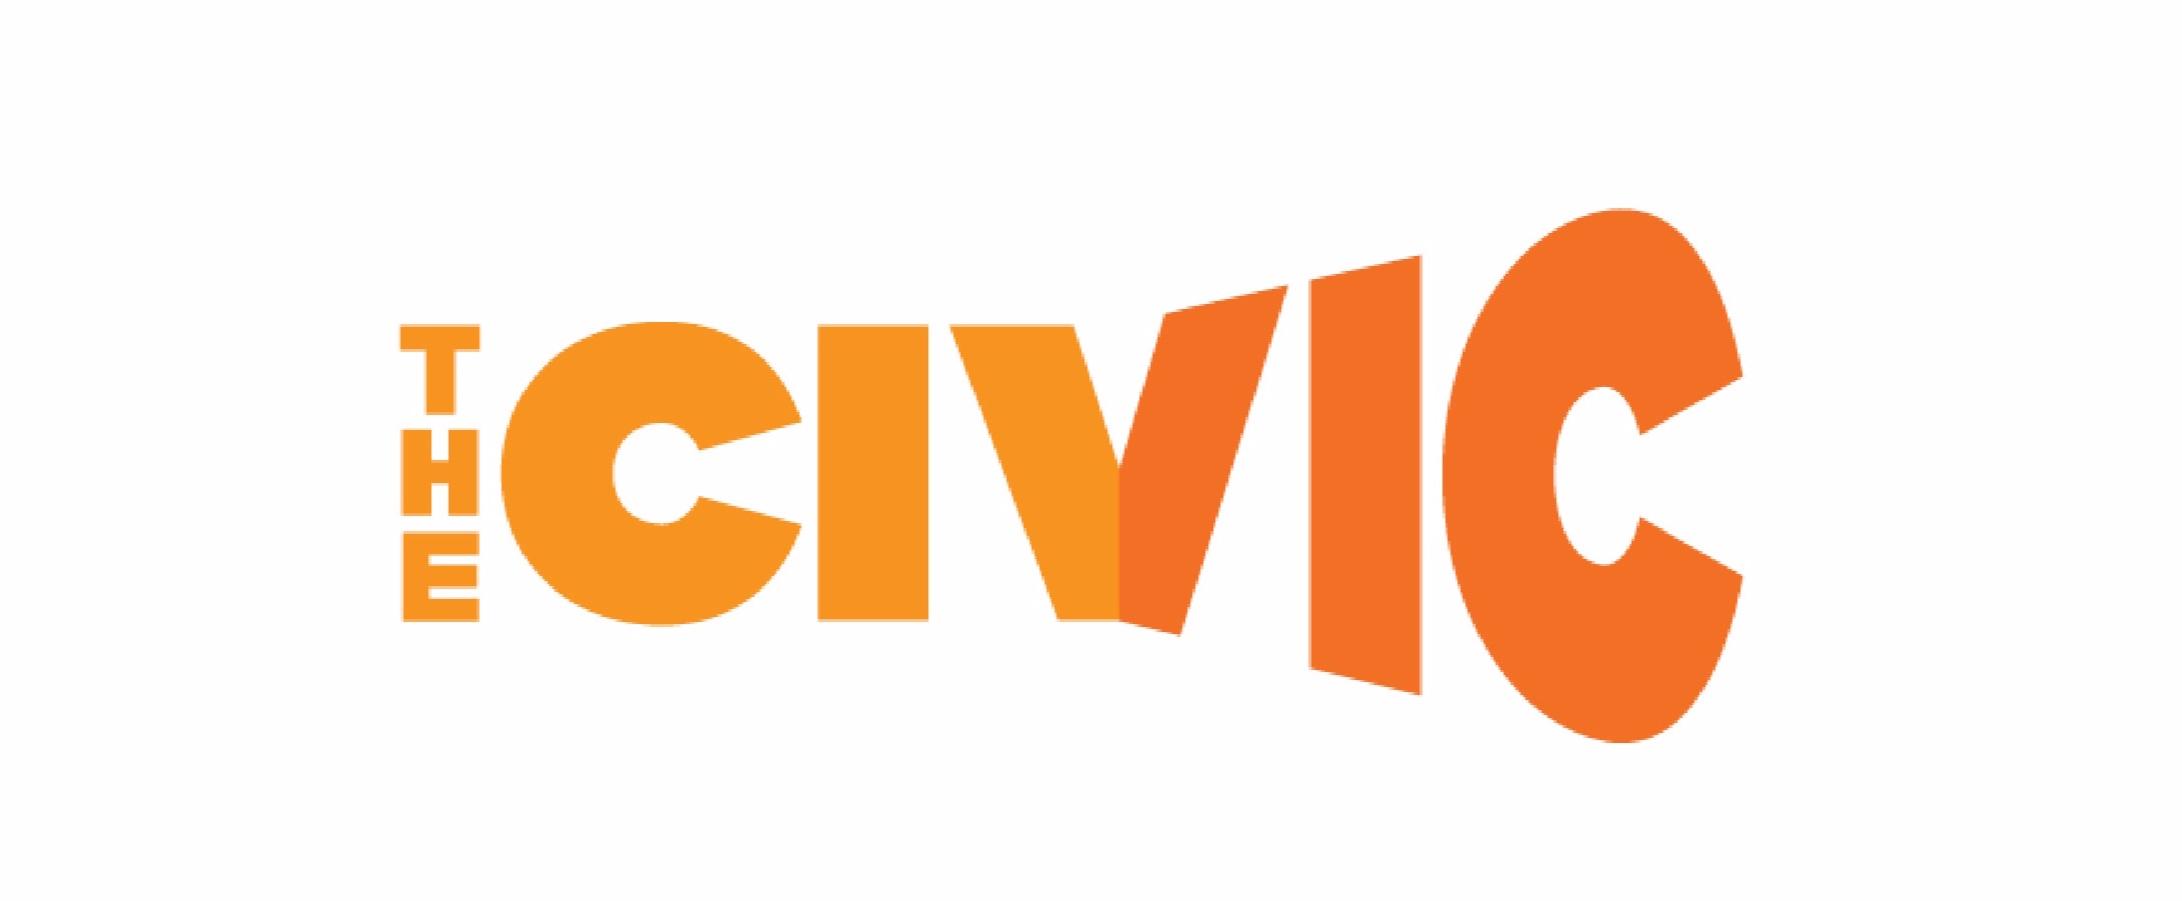 Civic_WebsiteAssets_Logo%2Bfor%2BWeb.jpg